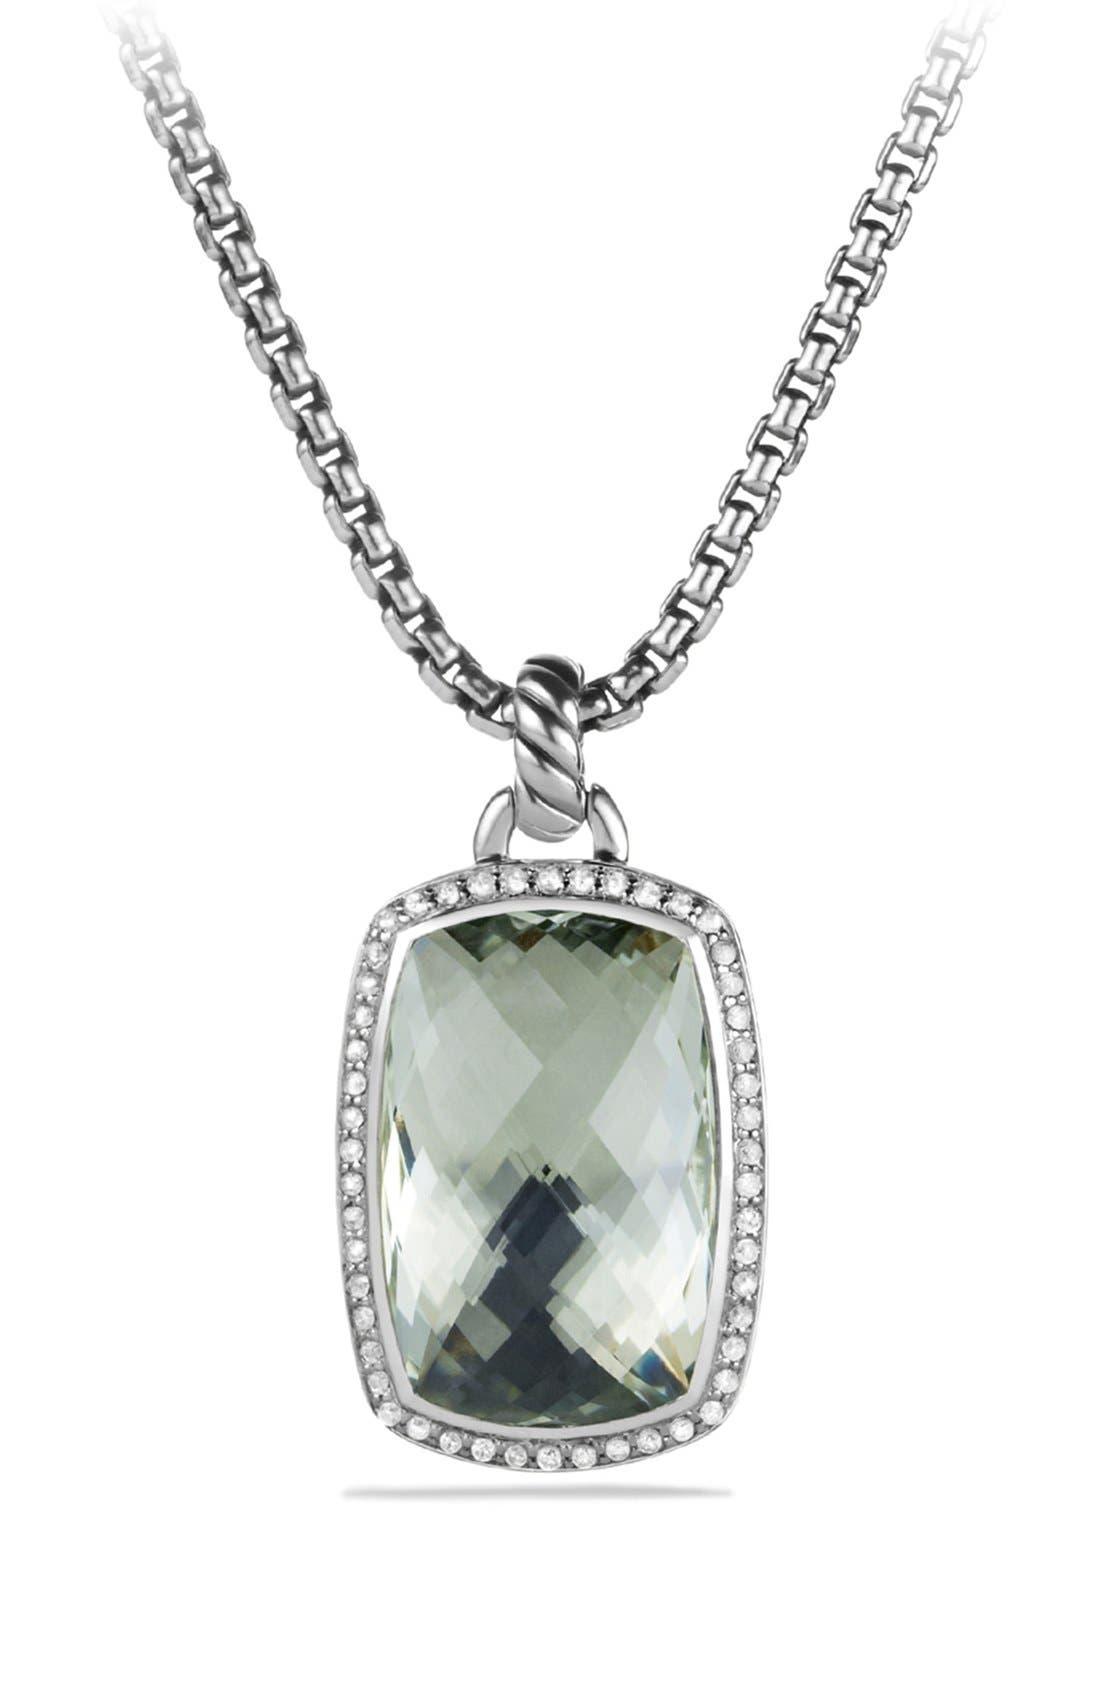 David Yurman 'Albion' Pendant with Semiprecious Stone and Diamonds